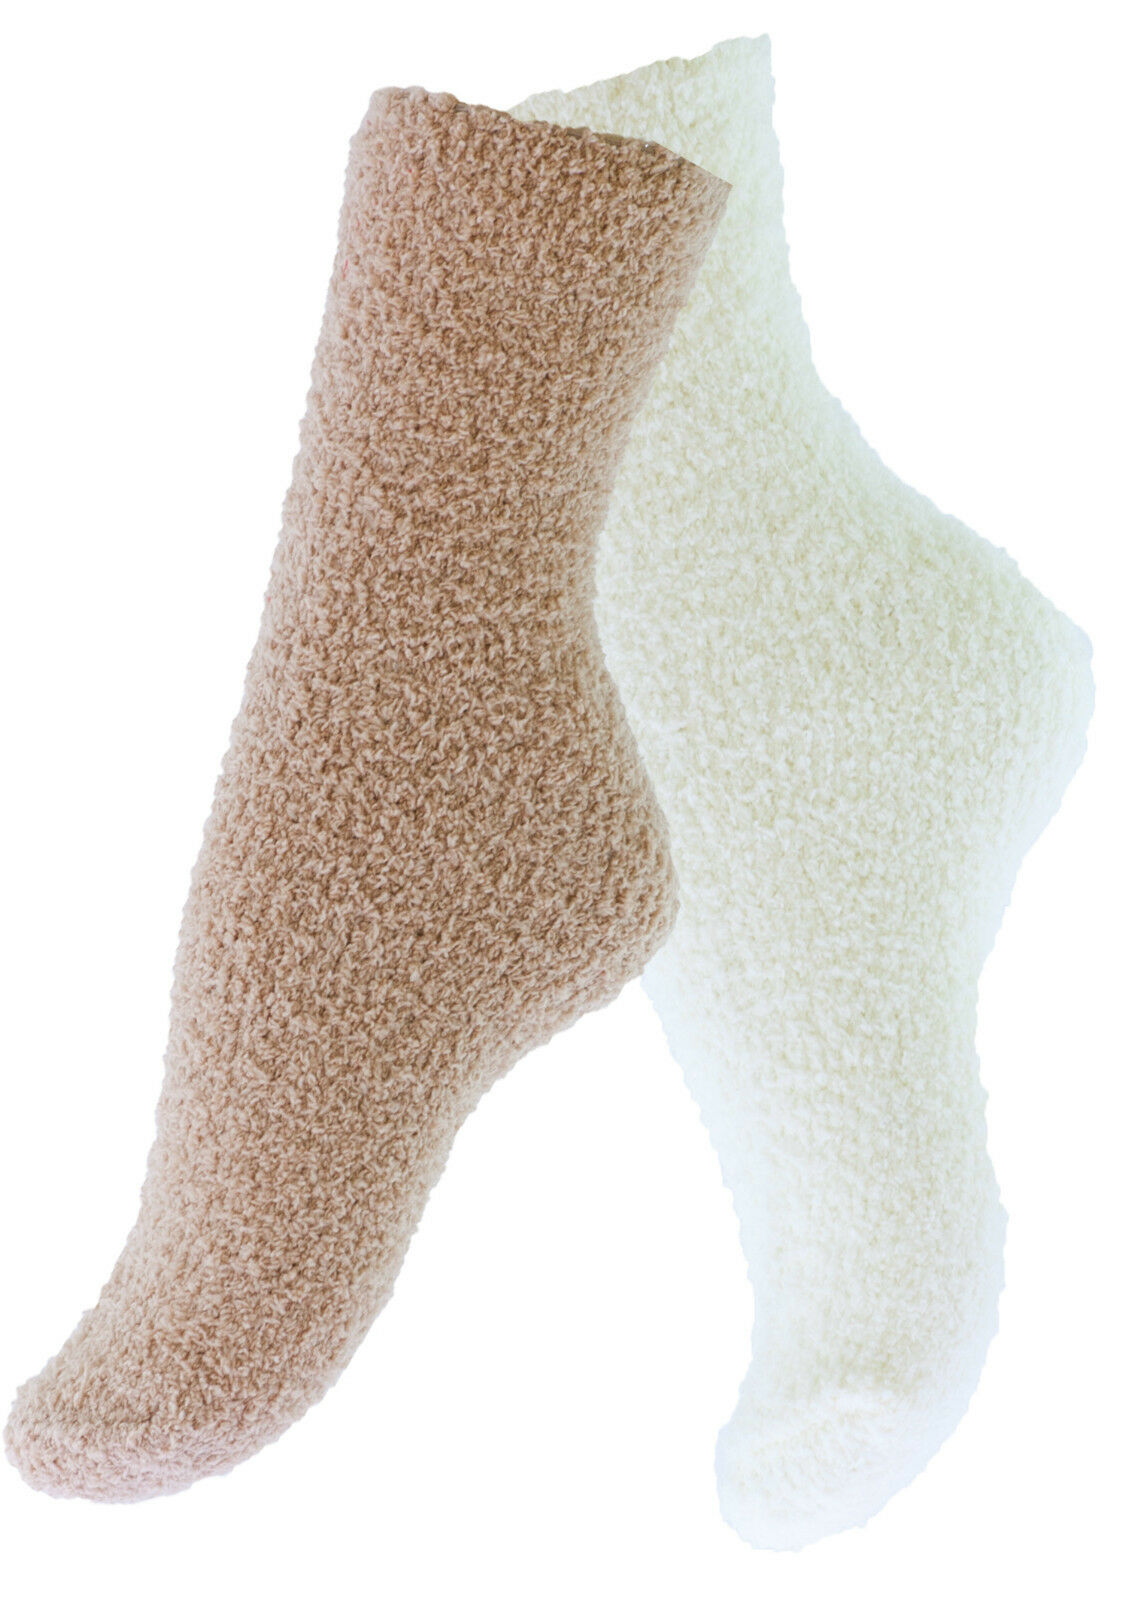 2 oder 4 Paar Kuschelsocken Plüschsocken Damen Mädchen Socken Wintersocken